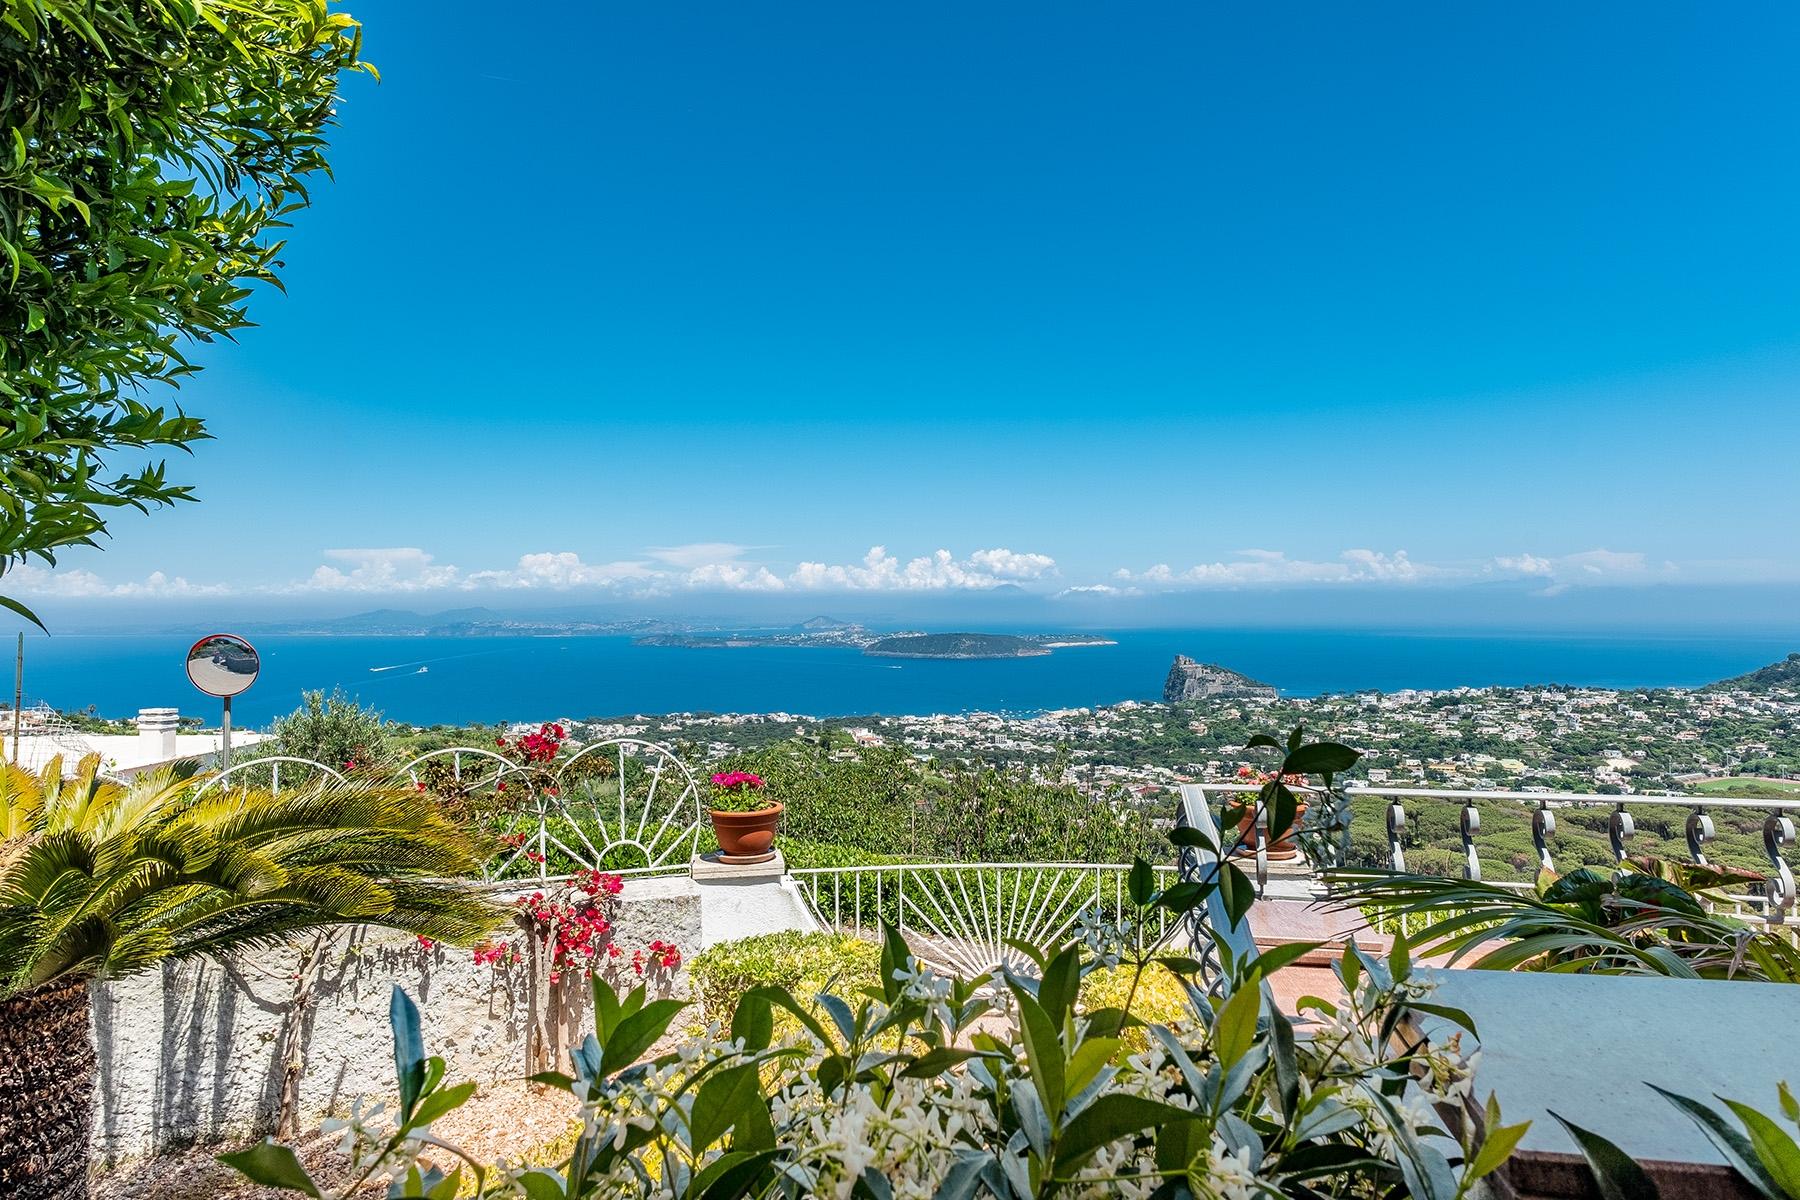 Villa in Vendita a Ischia: 5 locali, 138 mq - Foto 4